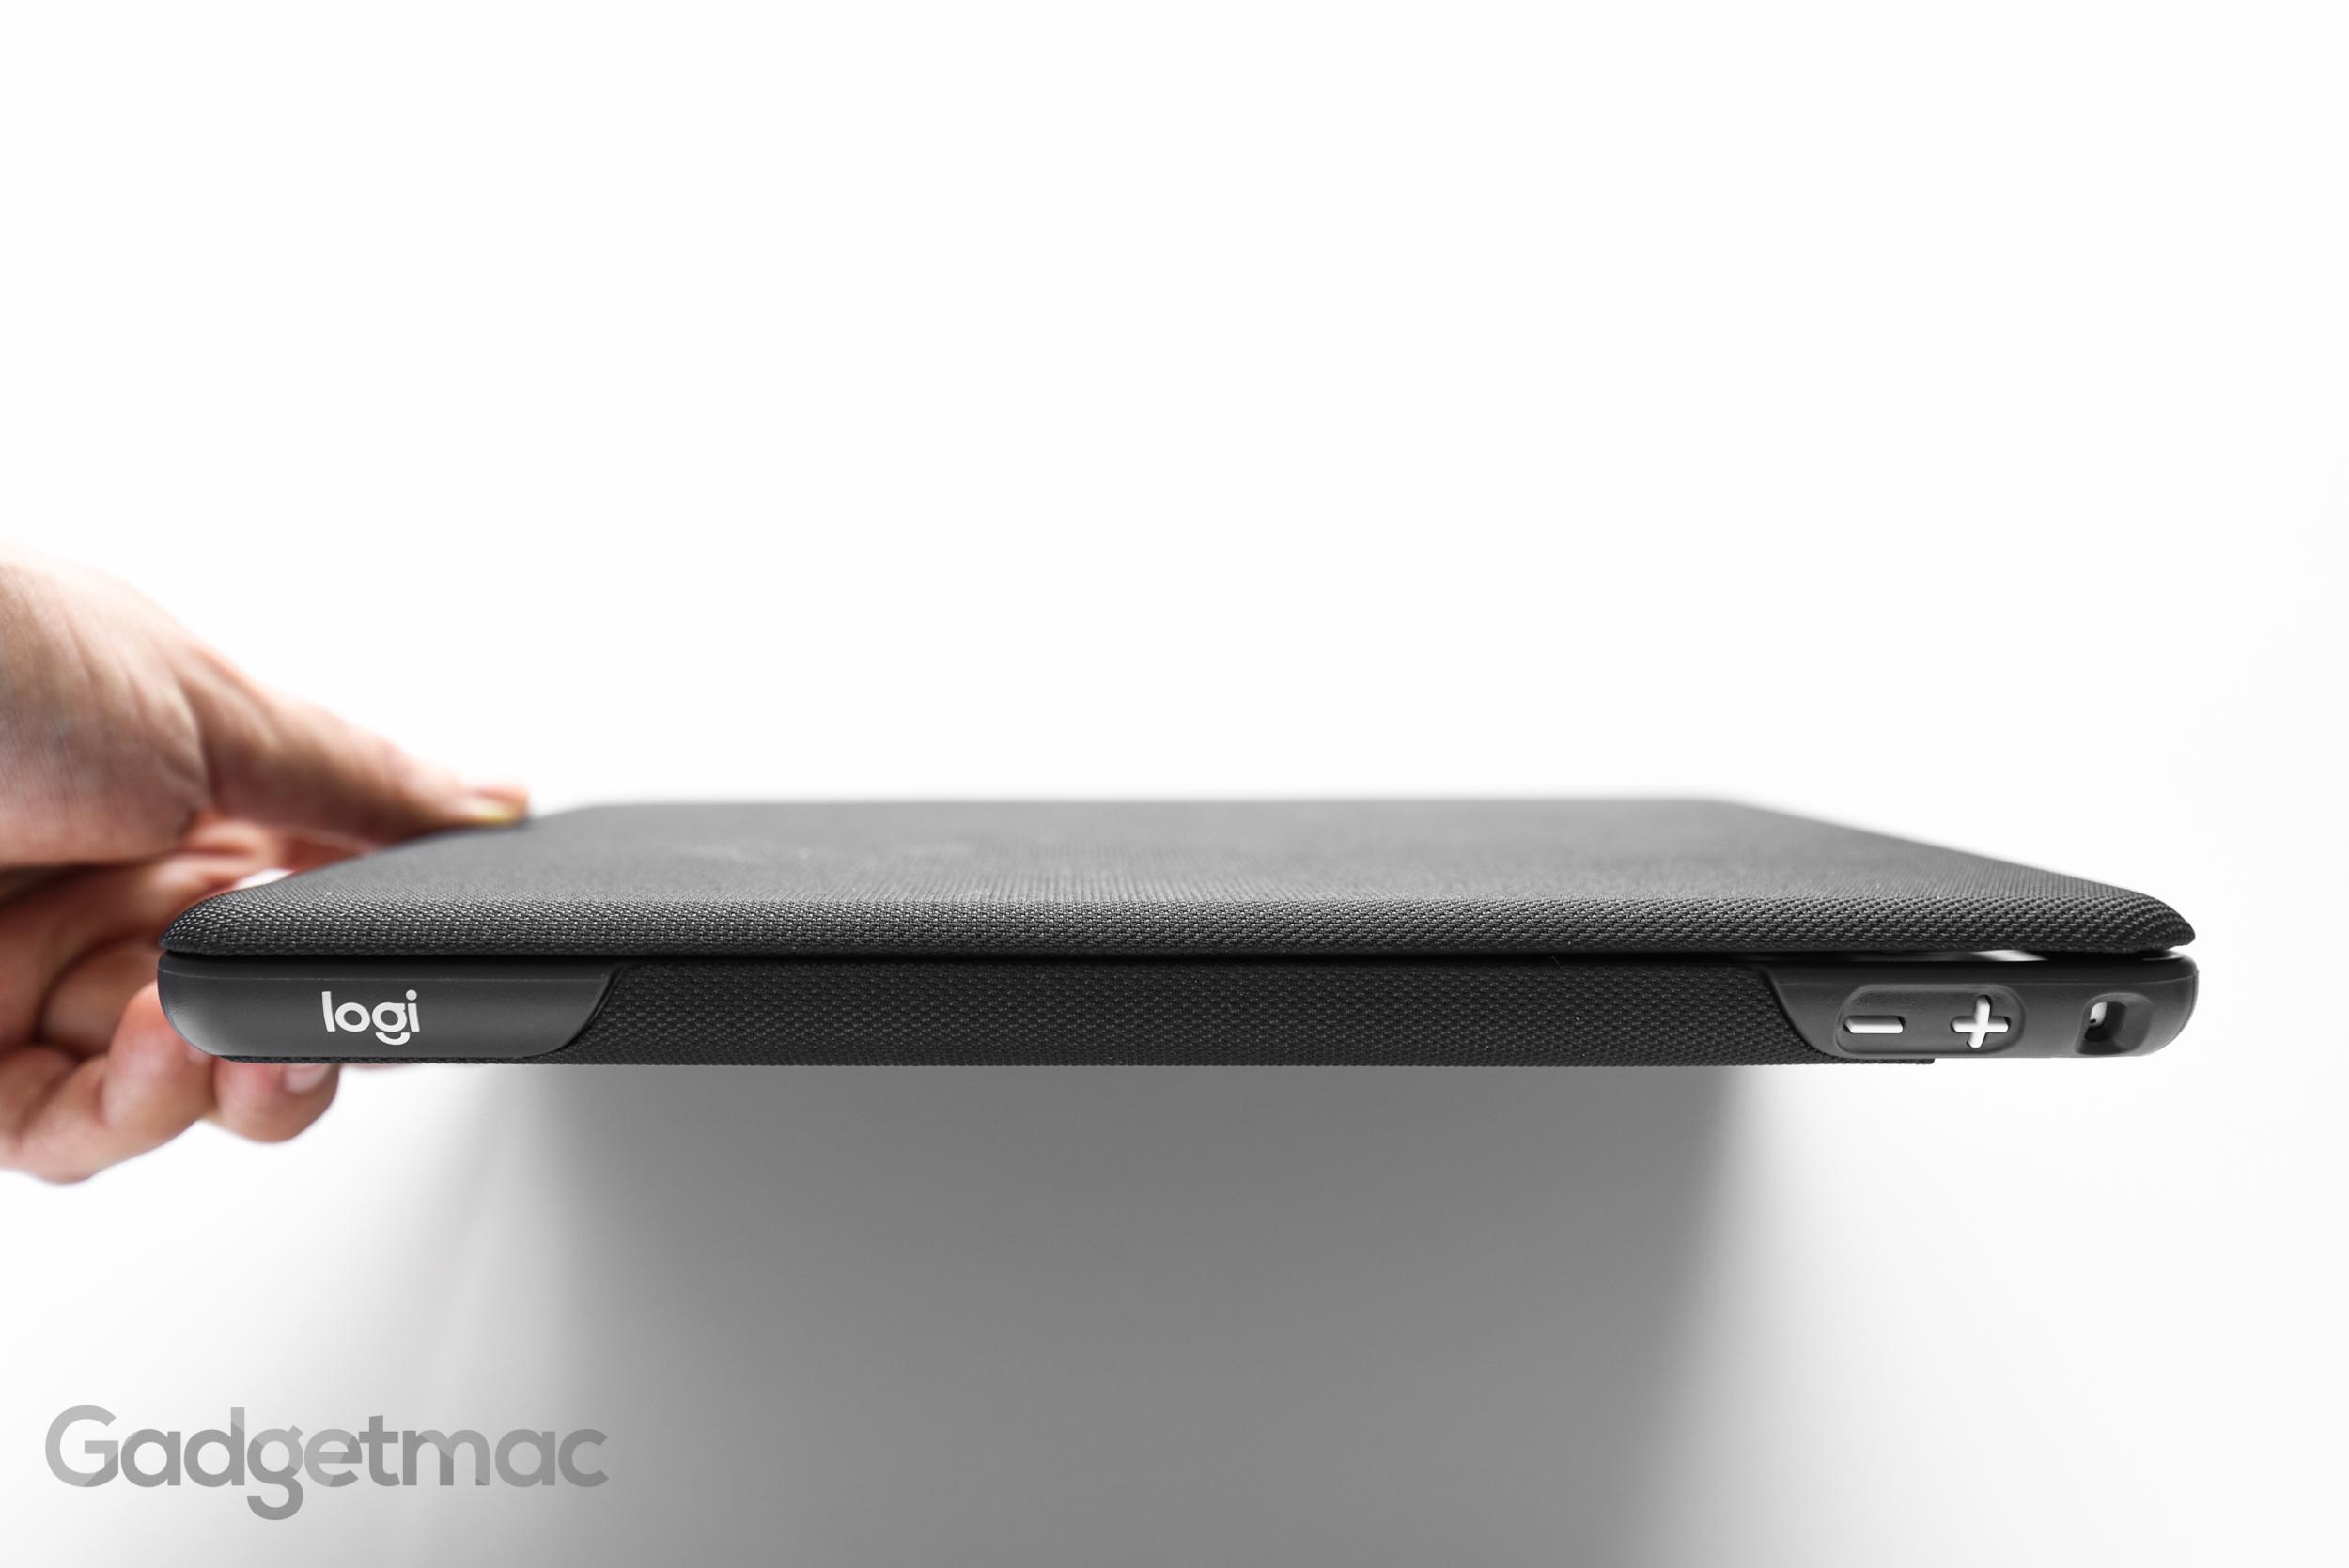 logitech-create-ipad-pro-9-7-inch-black.jpg